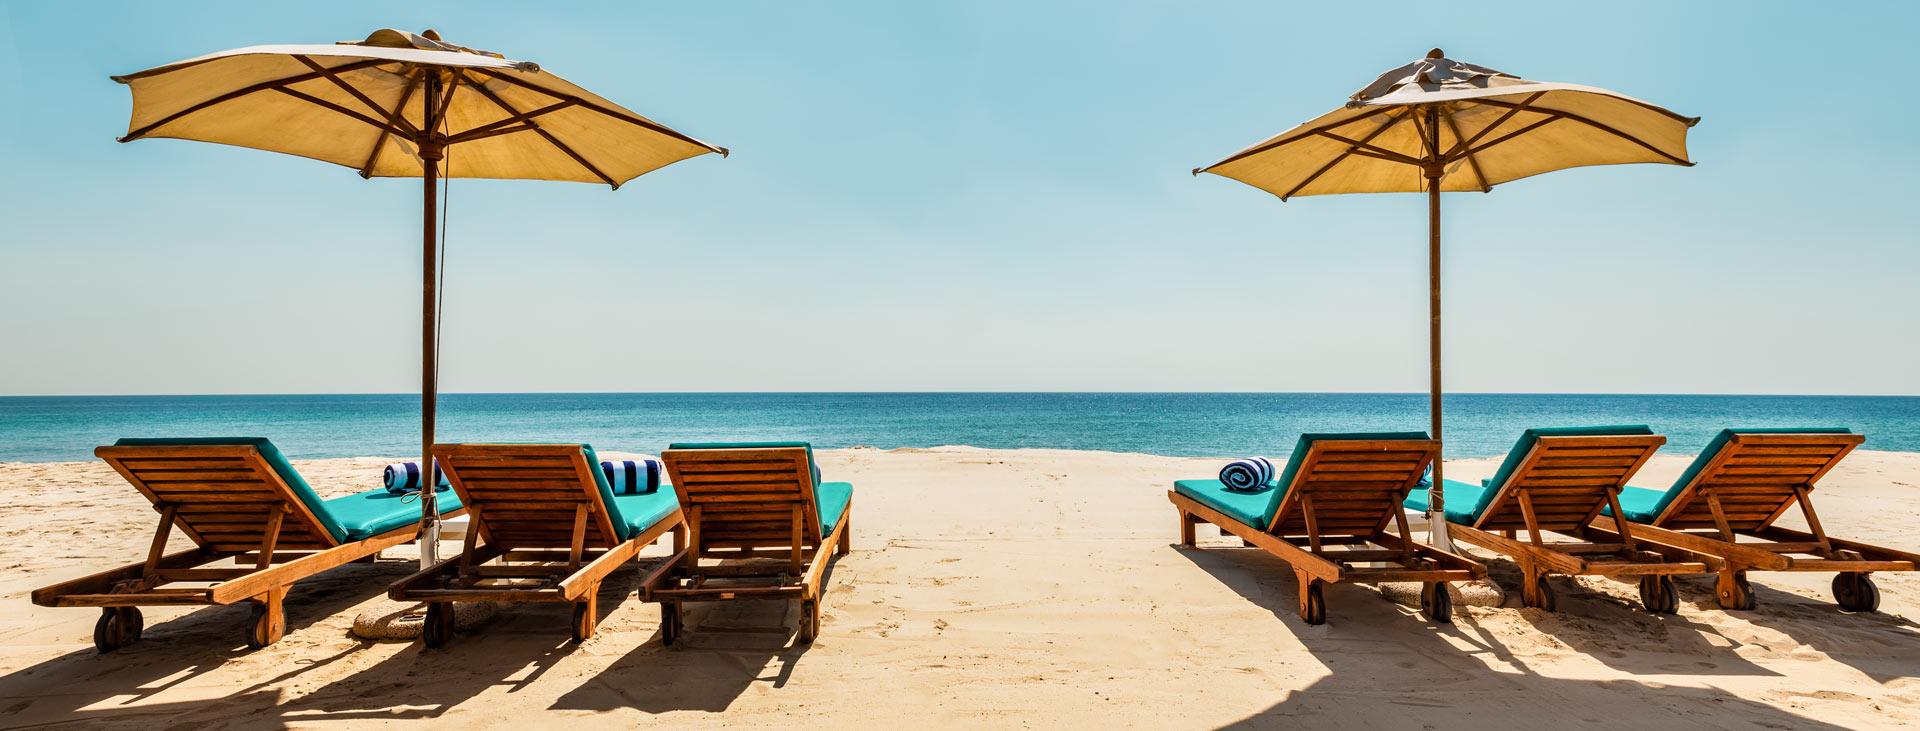 Sealine Beach, A Murwab Resort, Doha, Qatar